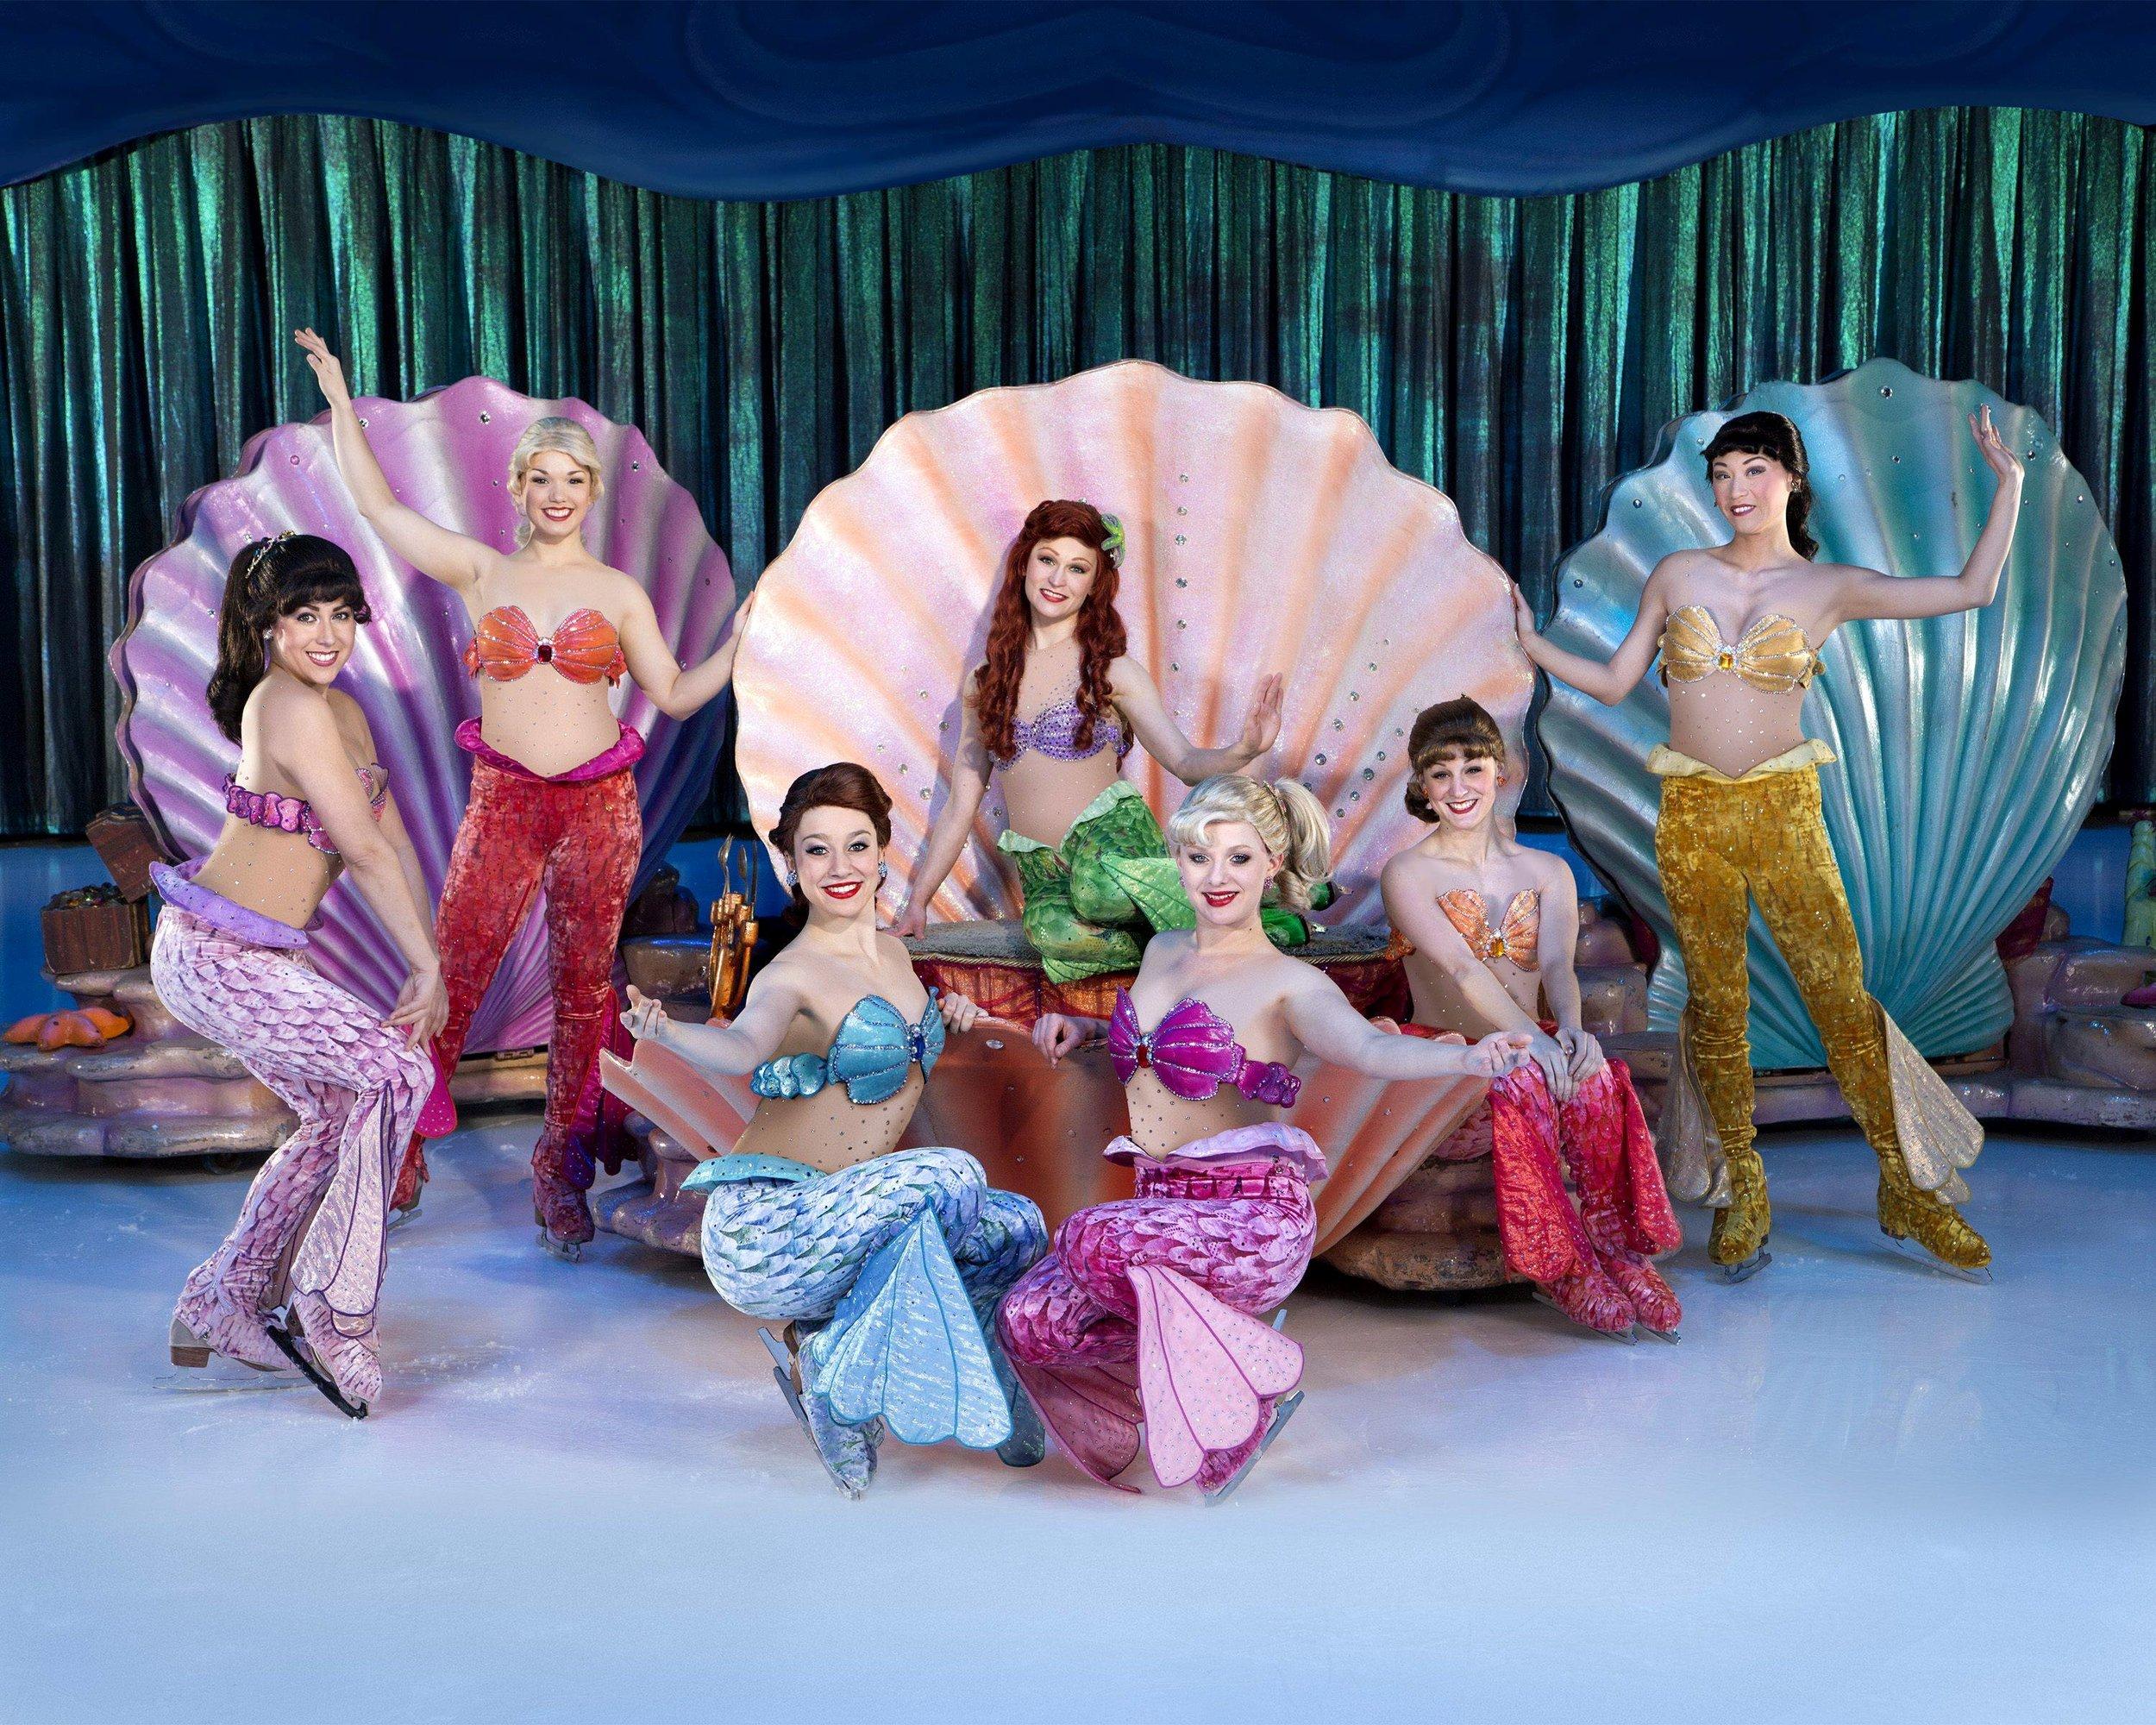 Disney On Ice presents Passport to Adventure - The Little Mermaid